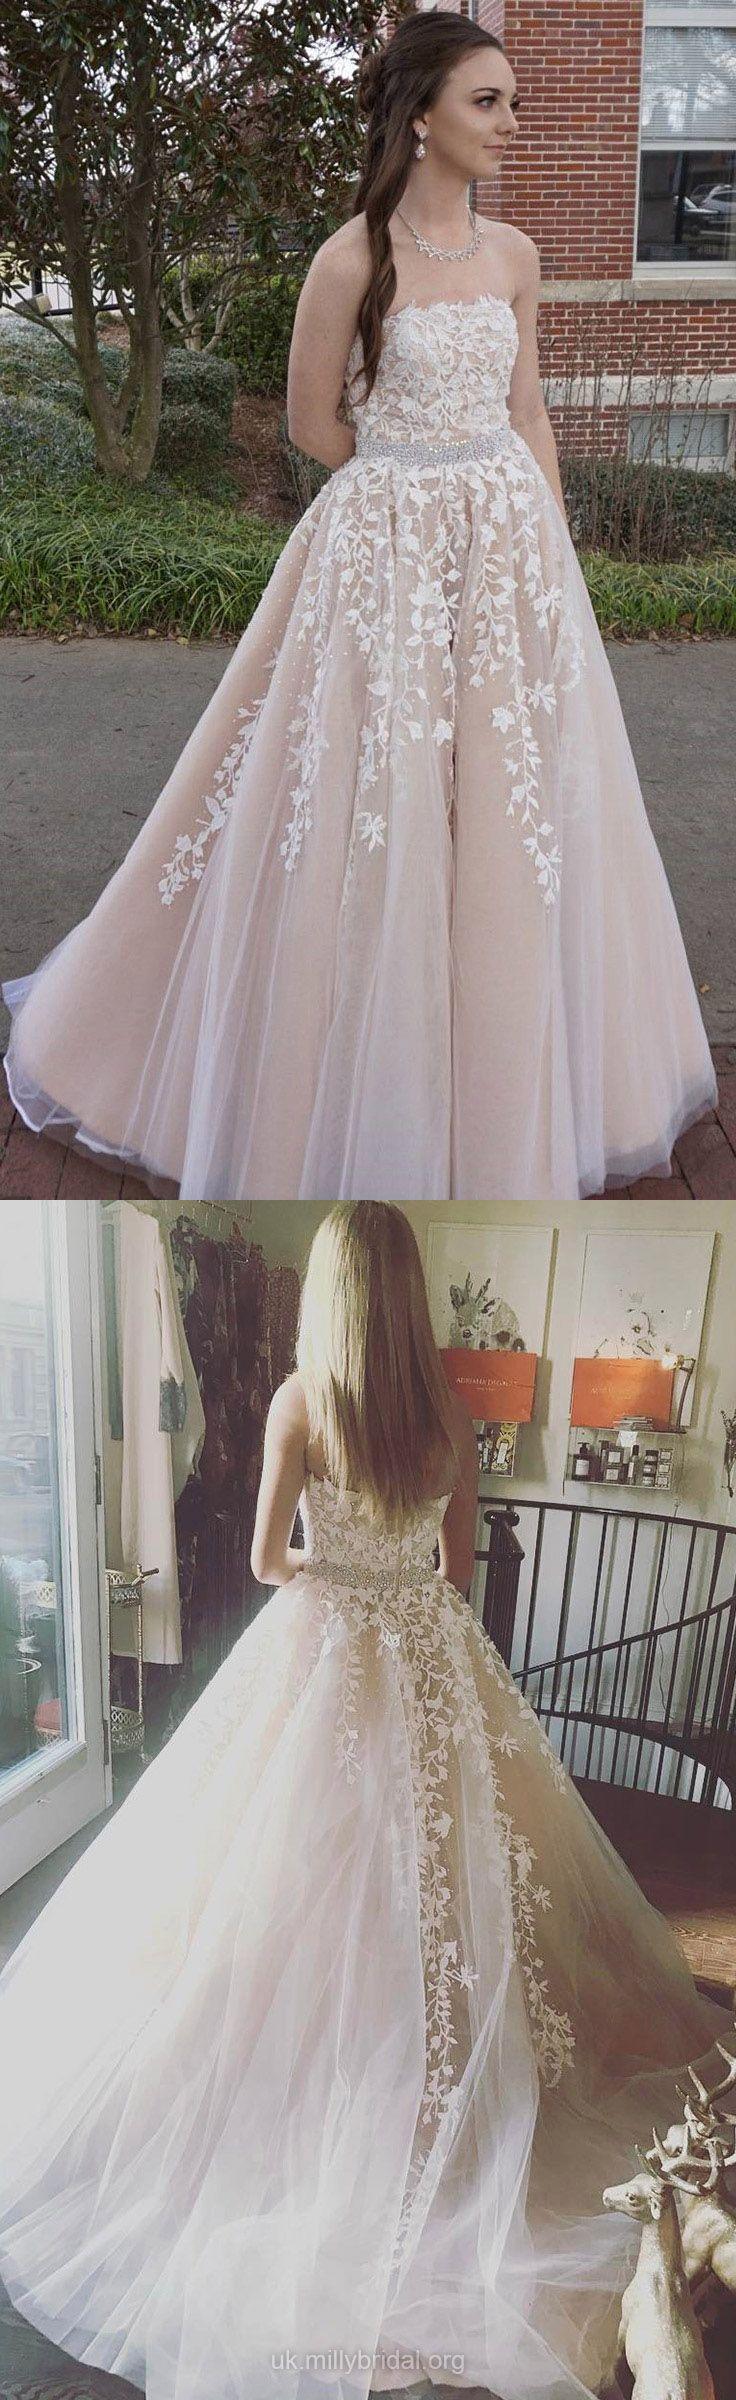 Pink formal dresses long princess prom dresses vintage lace